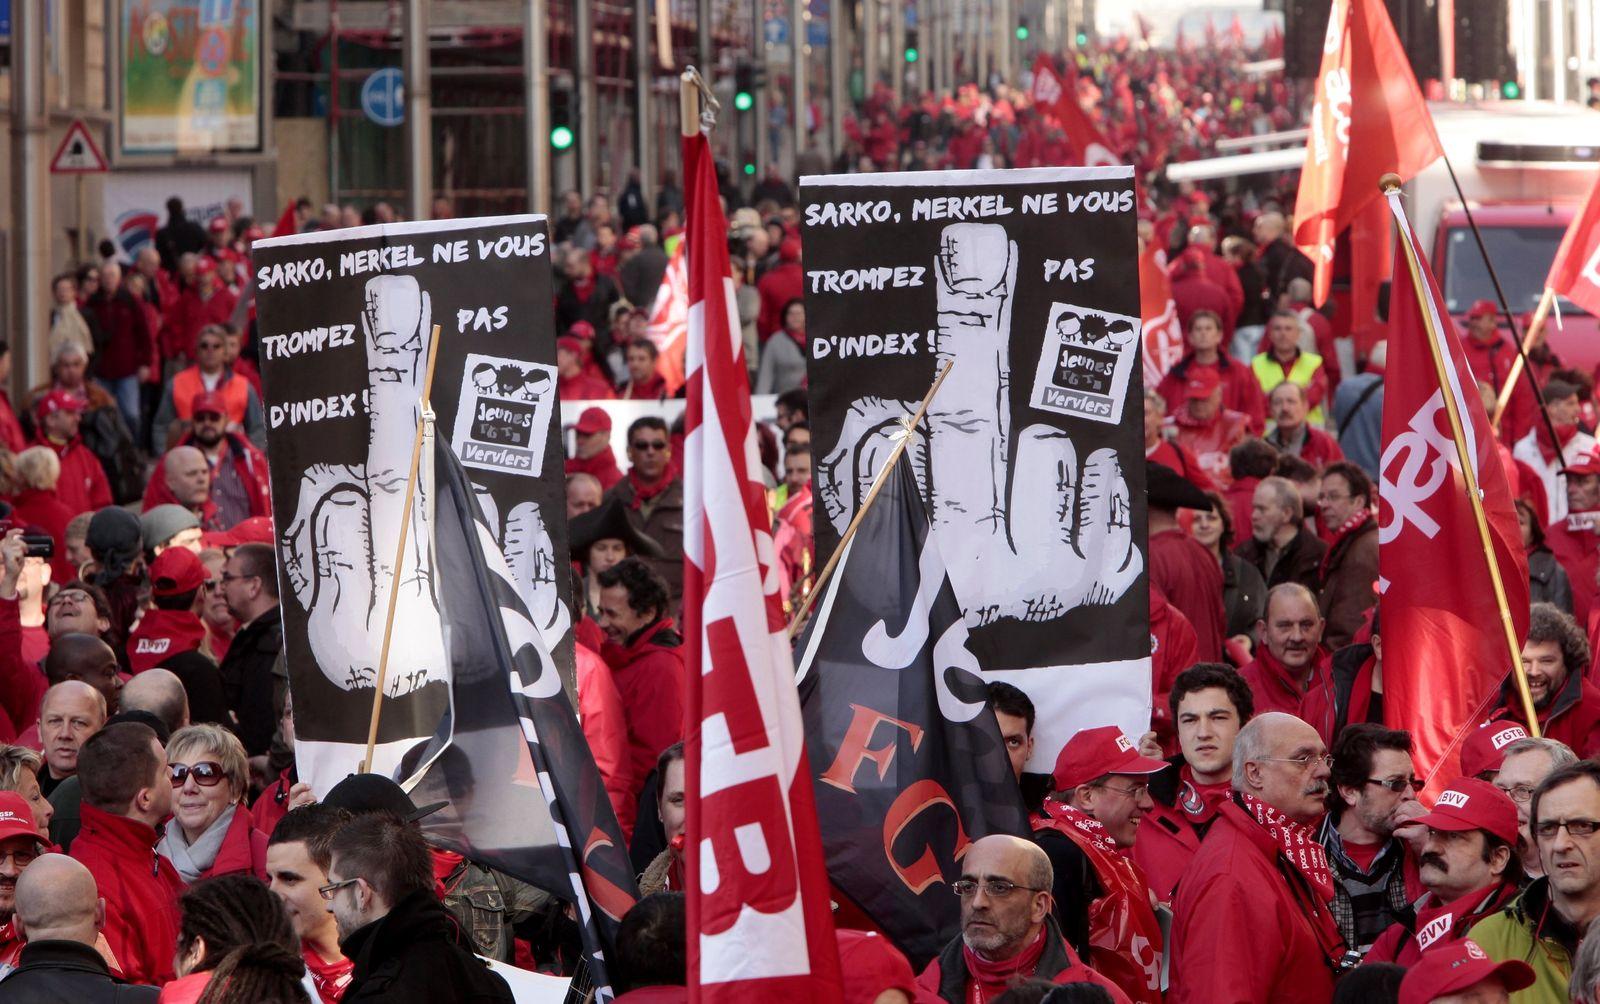 Brussels rally eu